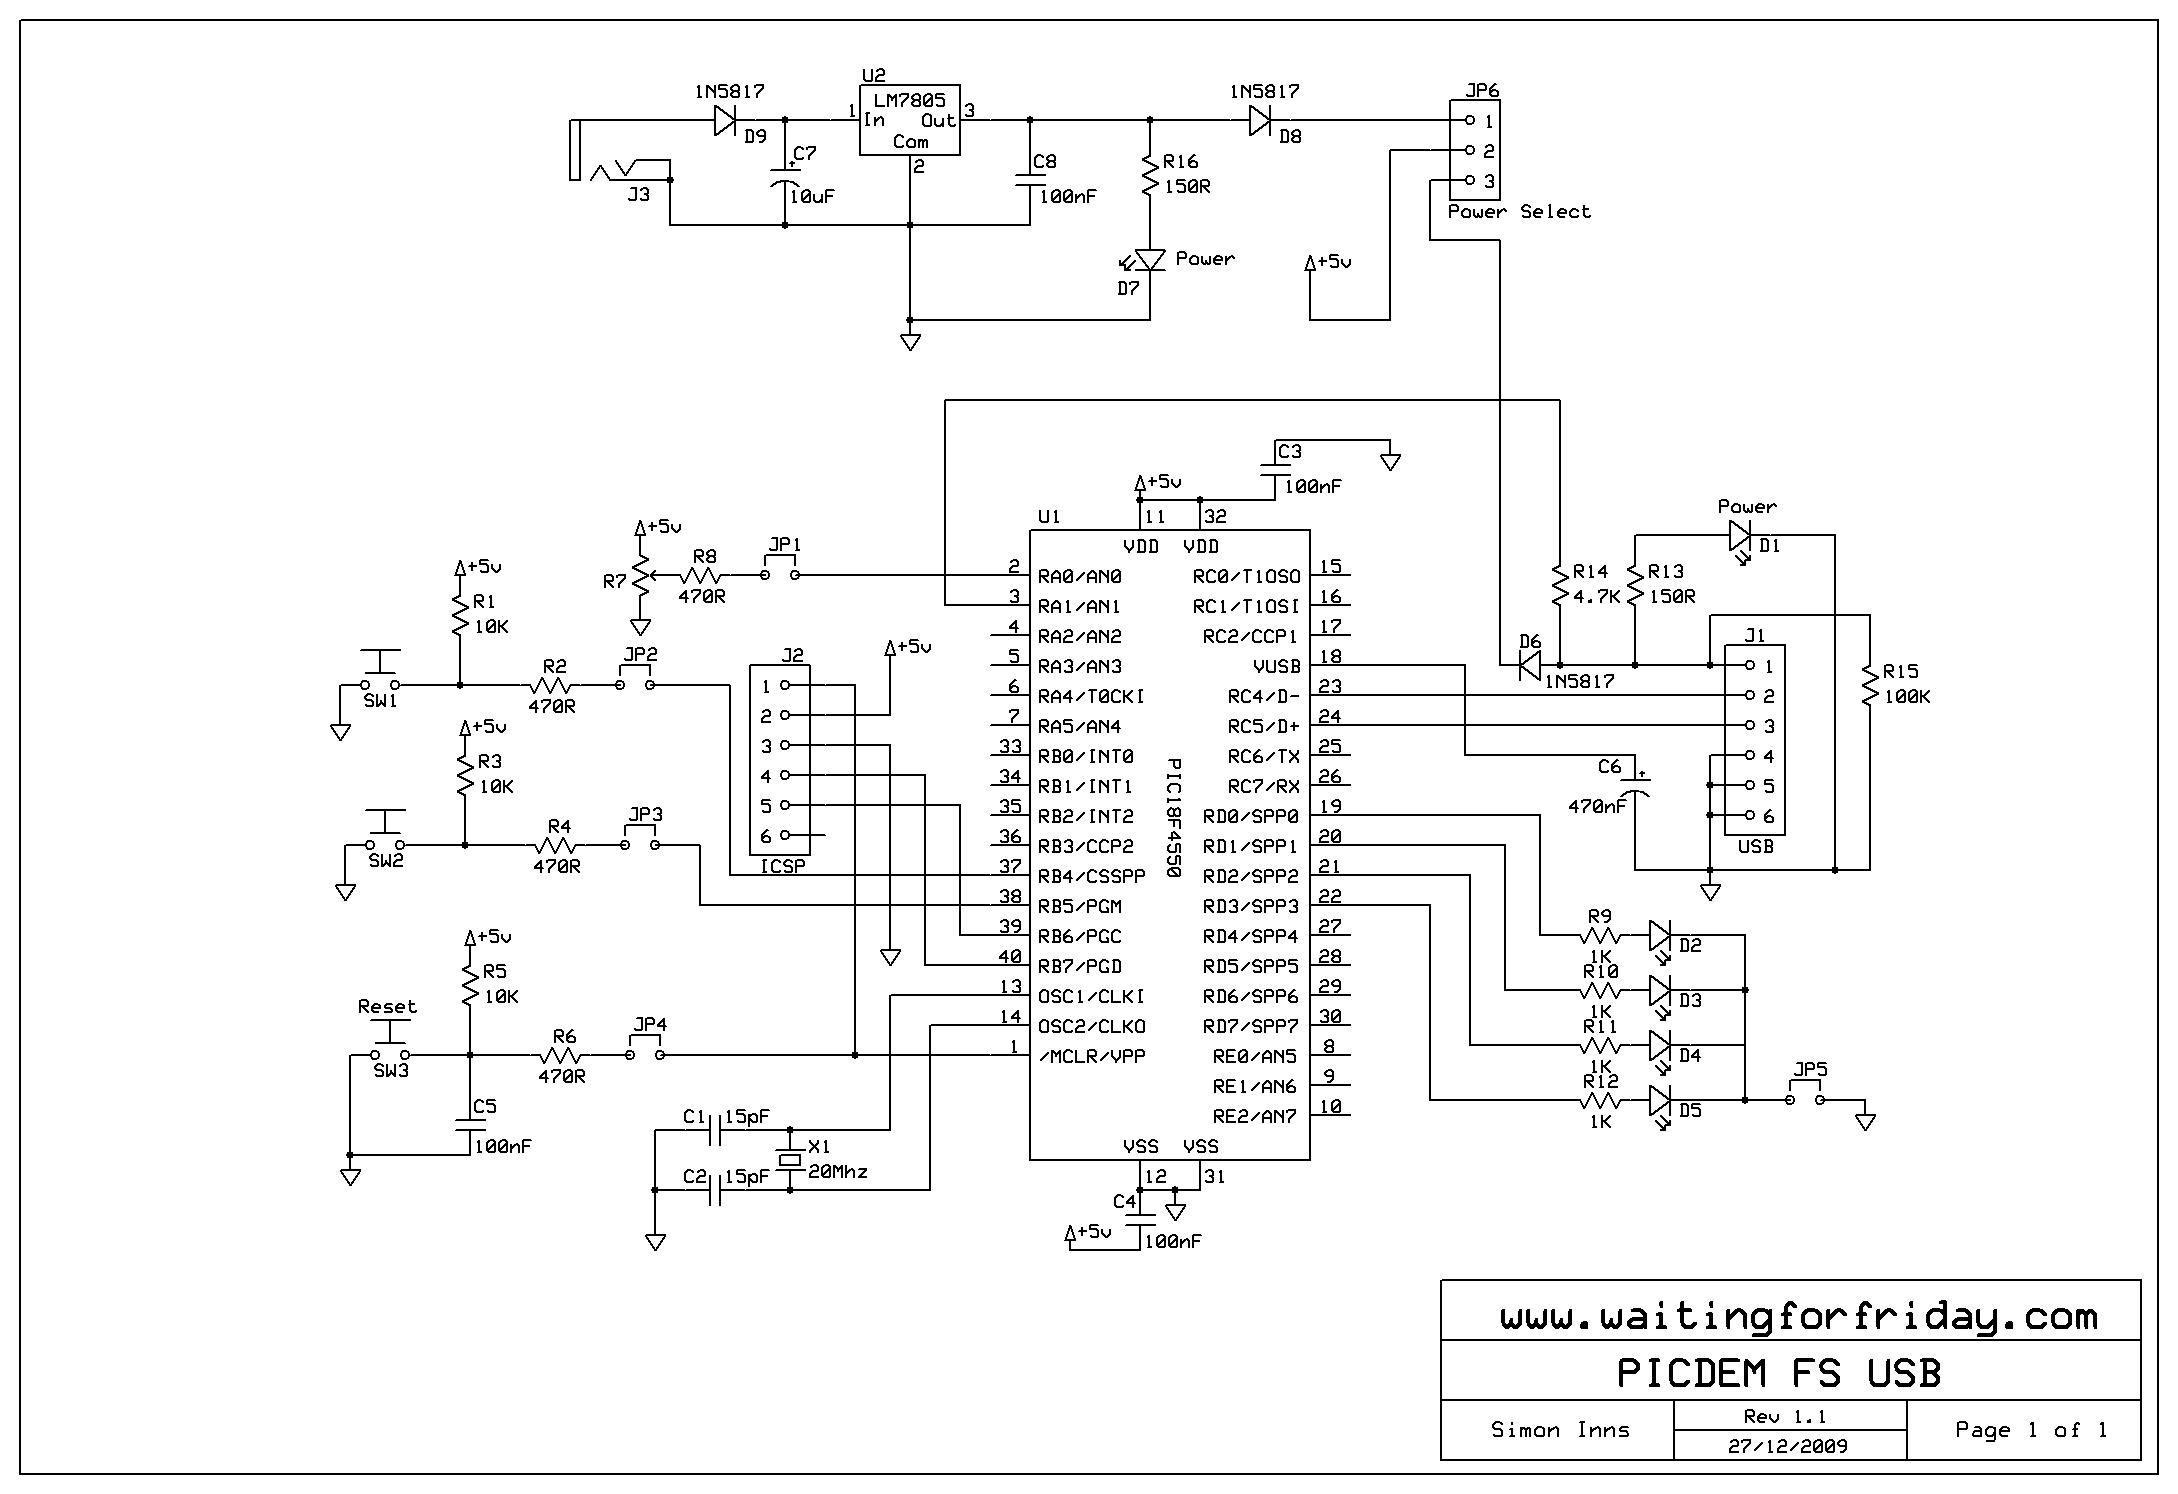 структурная схема pic12f629